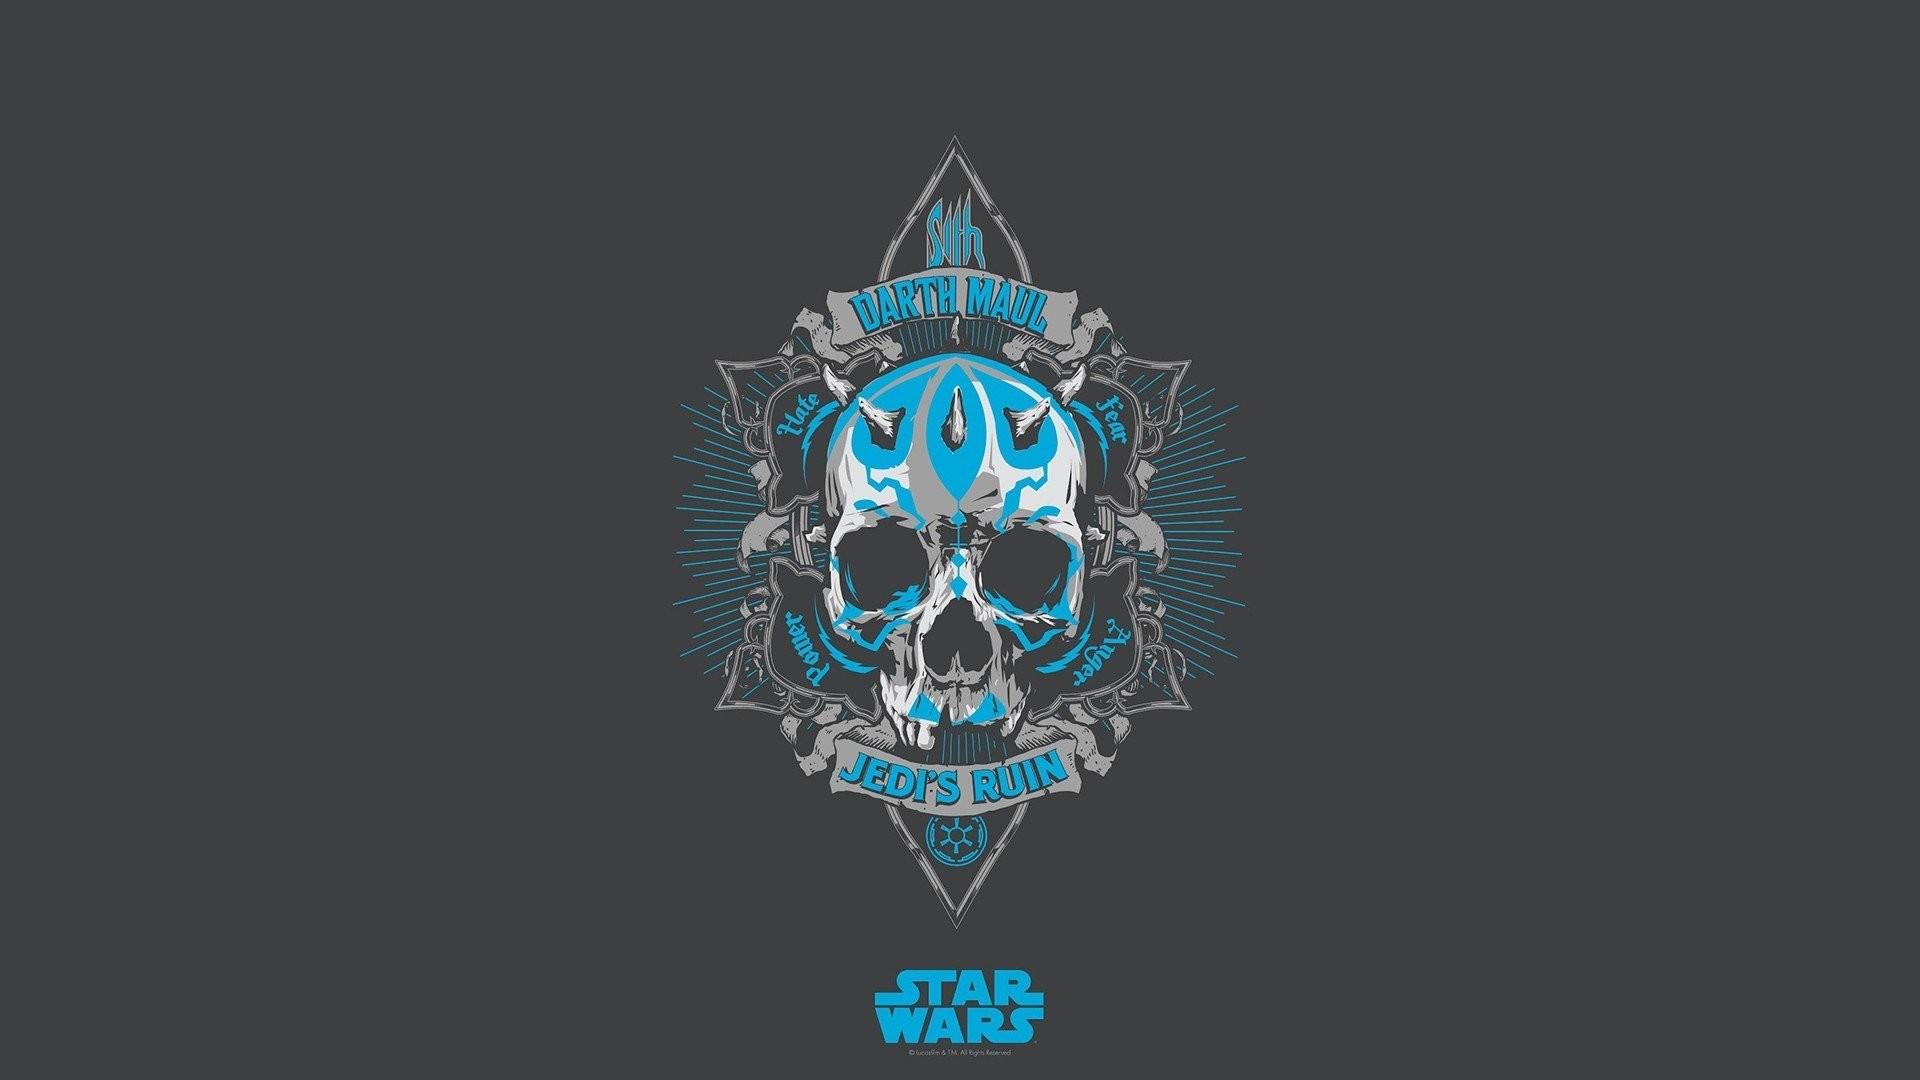 Star Wars Logos Darth Maul Jedi Sith …